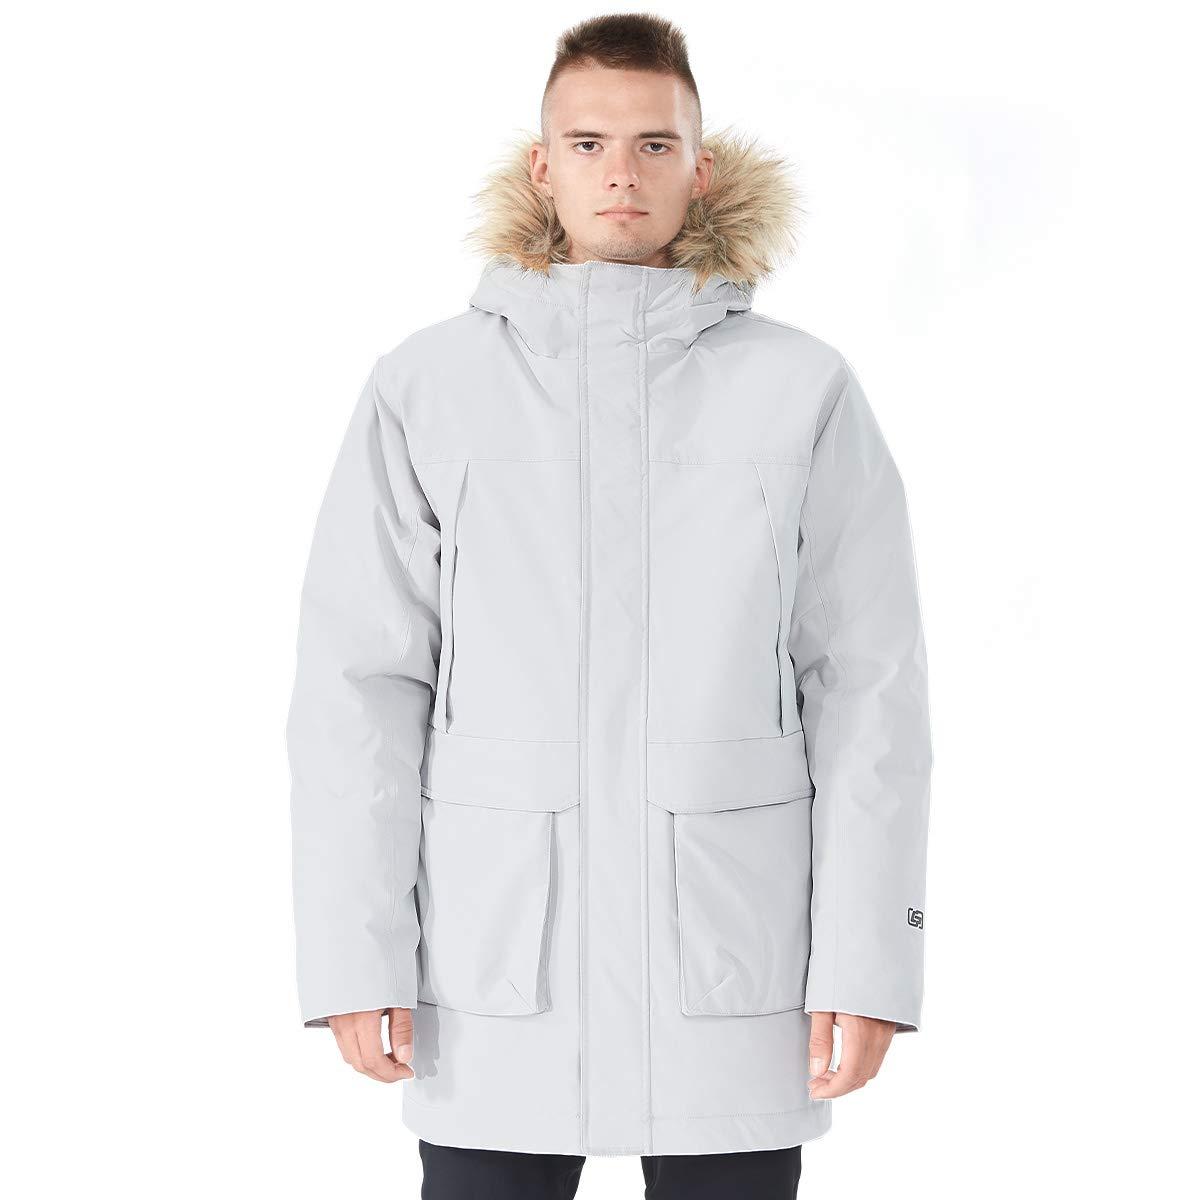 GYMAX Men's Long Down Coat, Removable Faux Fur Hood Thicken Winter Coat Down Jacket Parka Puffer Coat